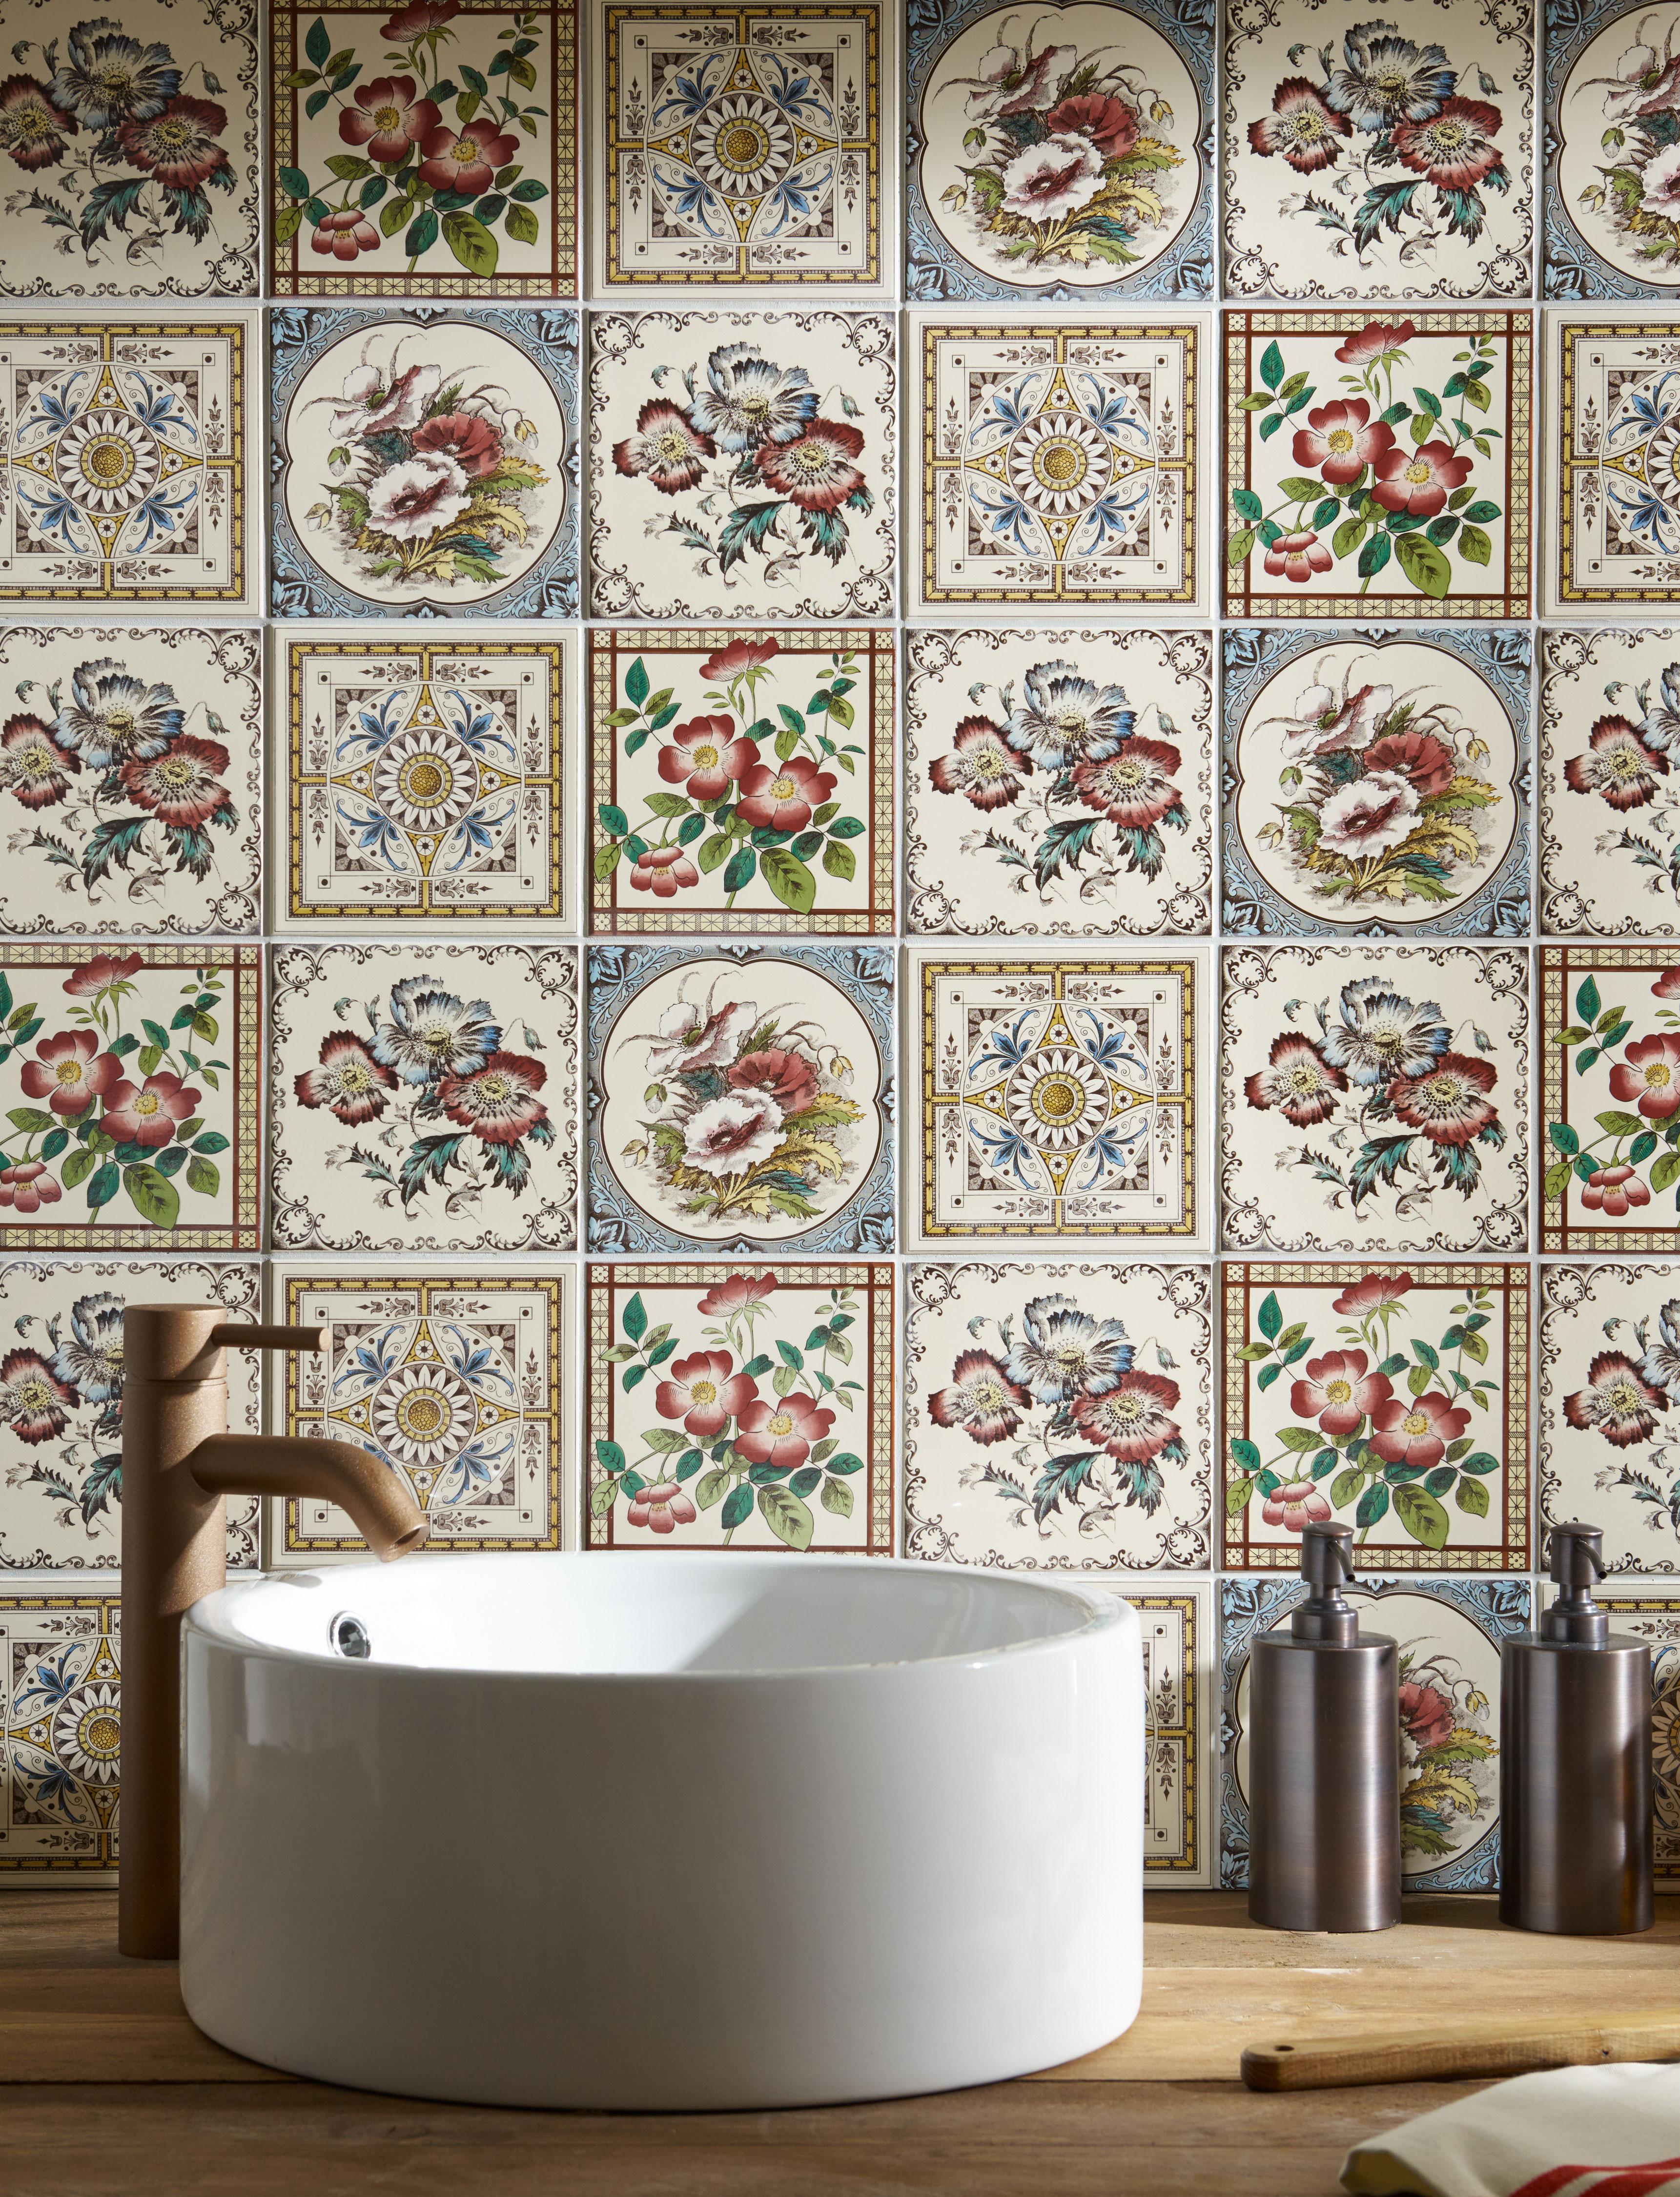 Tile Styling OriginalStyle_1548543_OriginalStyleArtworksVictori.jpg